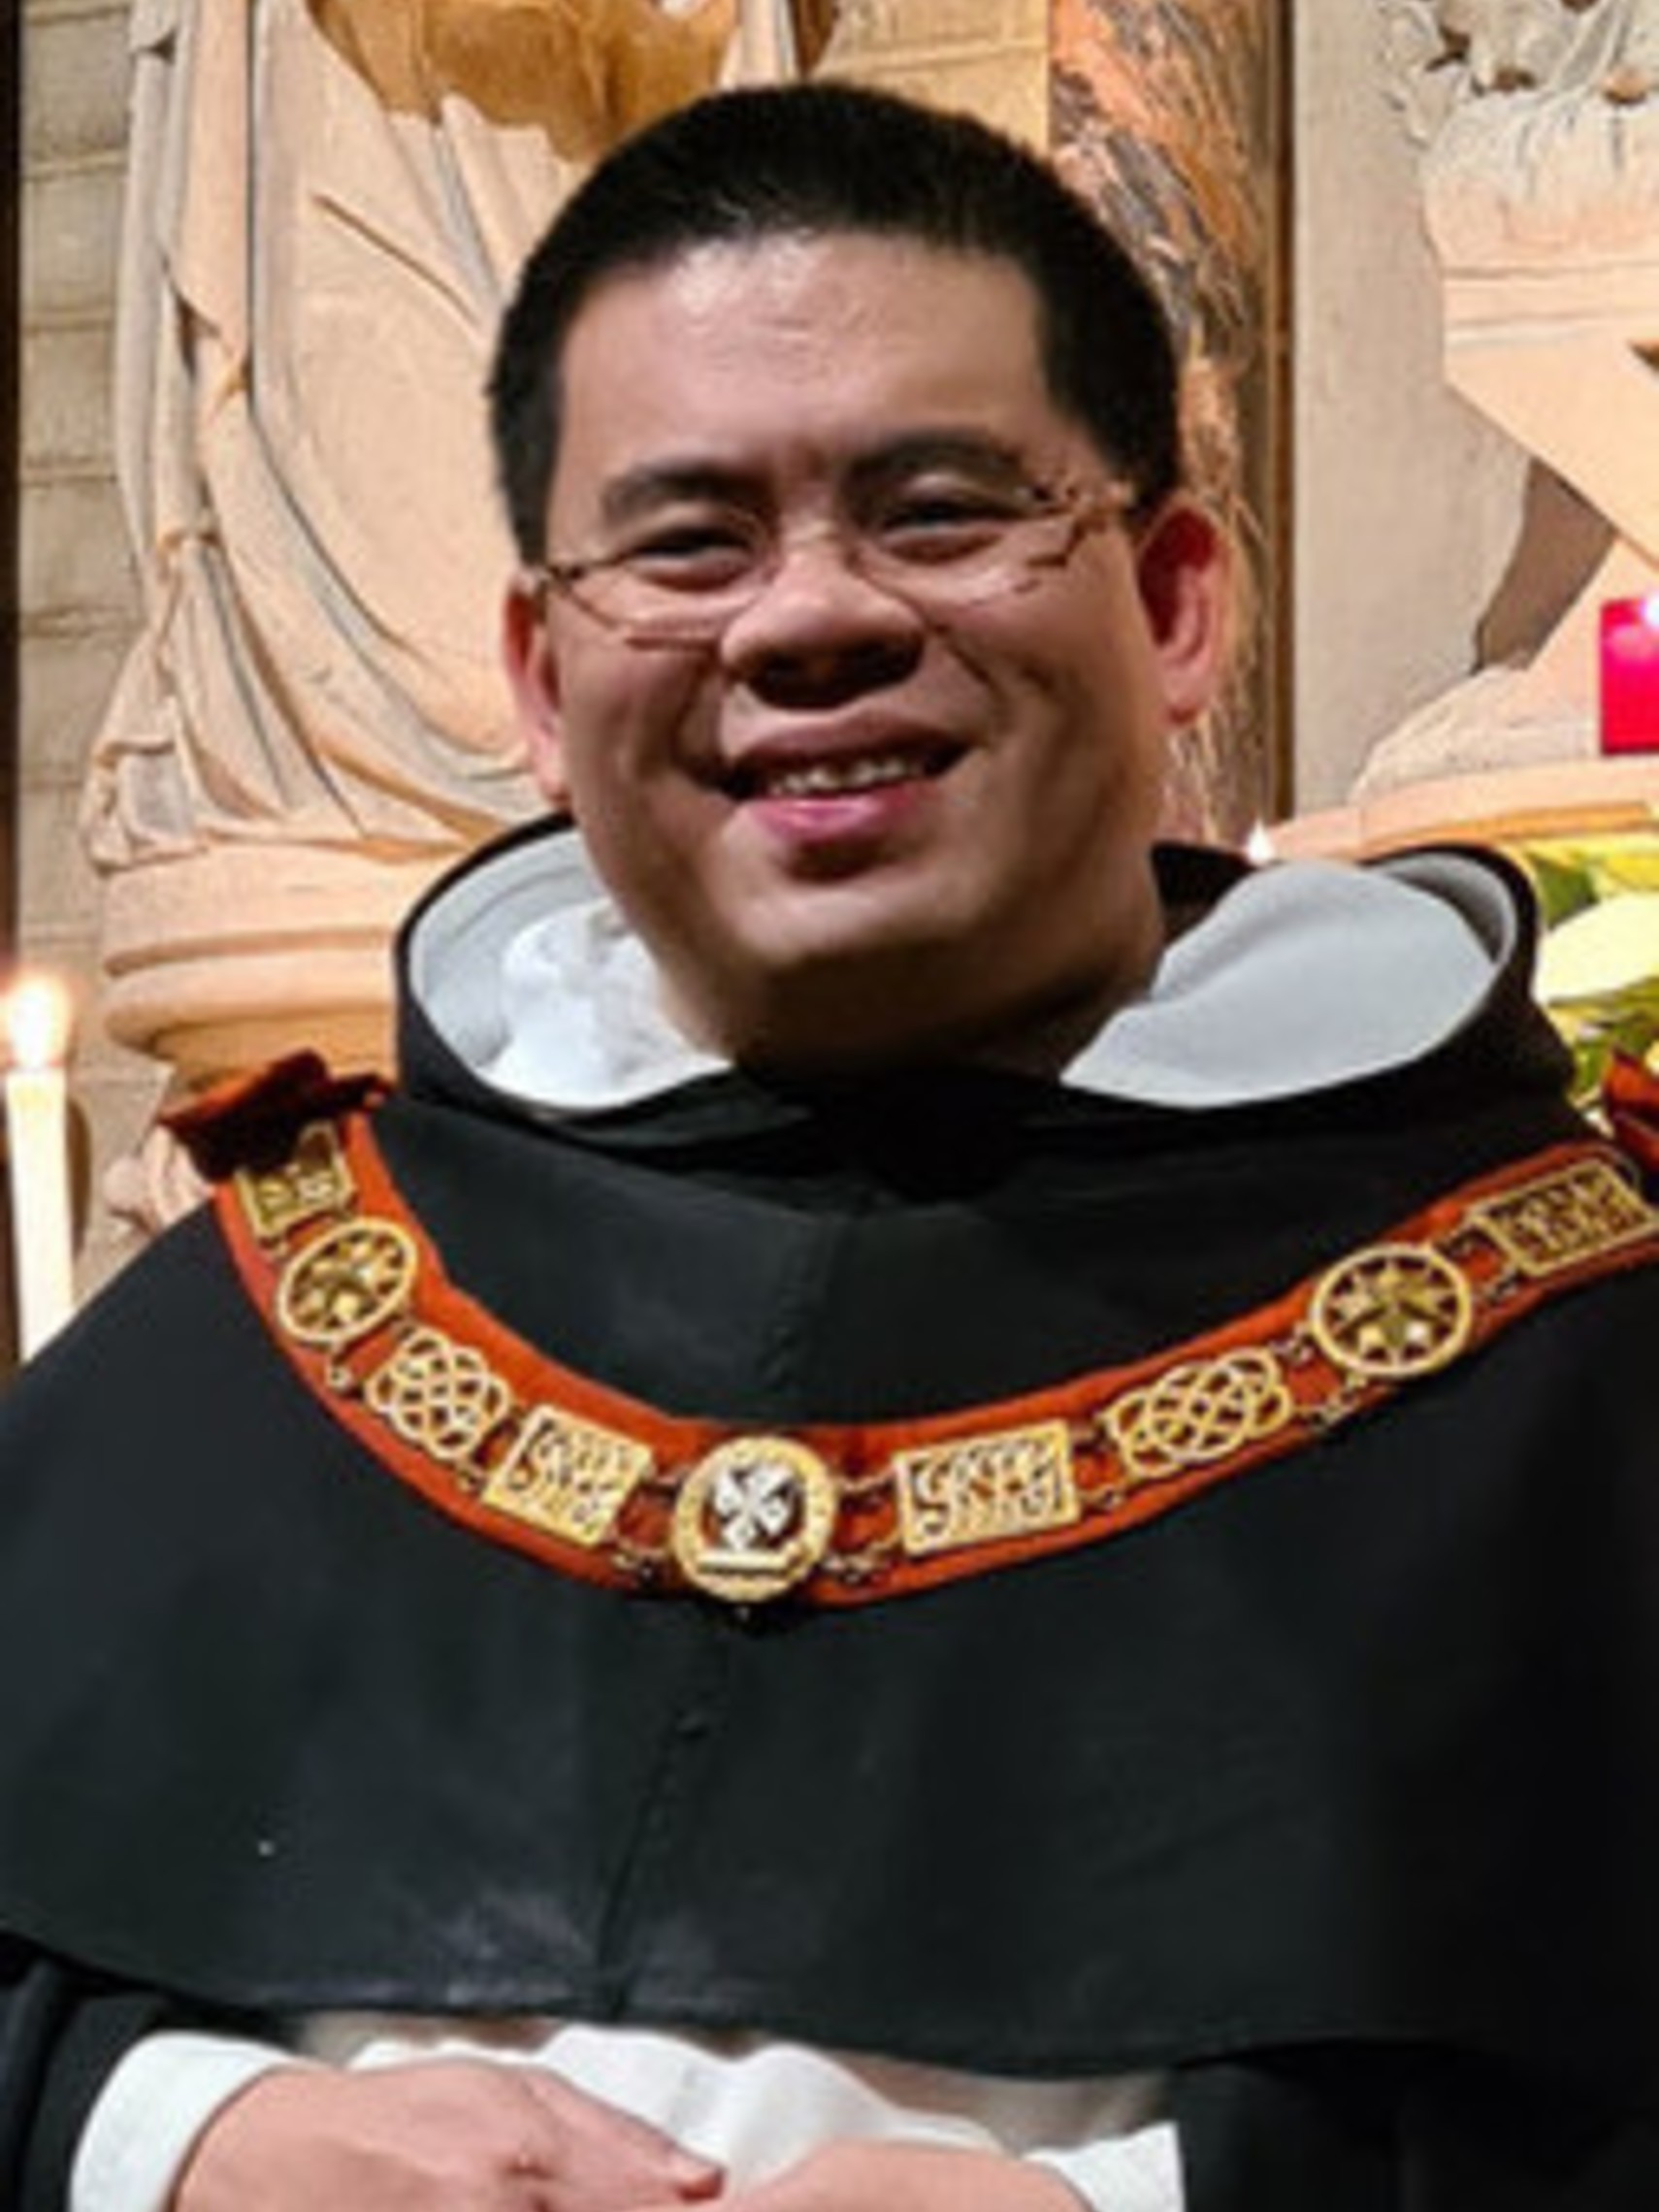 Fr. Lawrence Lew, O.P.